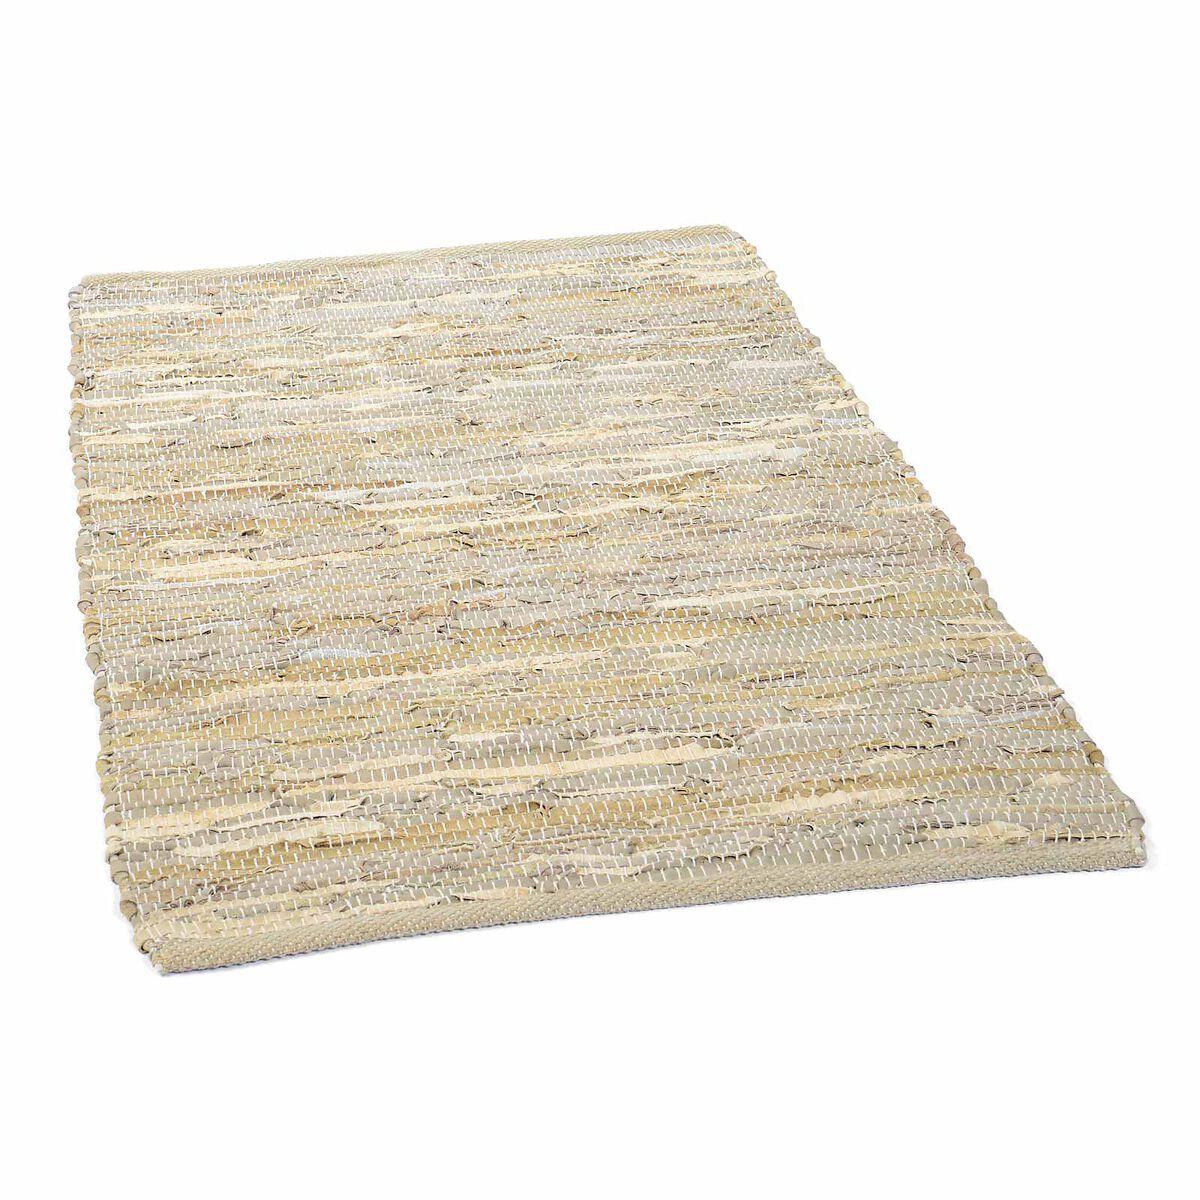 teppich aus recyceltem leder ca b 60 x l 90cm hellbeige depot de. Black Bedroom Furniture Sets. Home Design Ideas